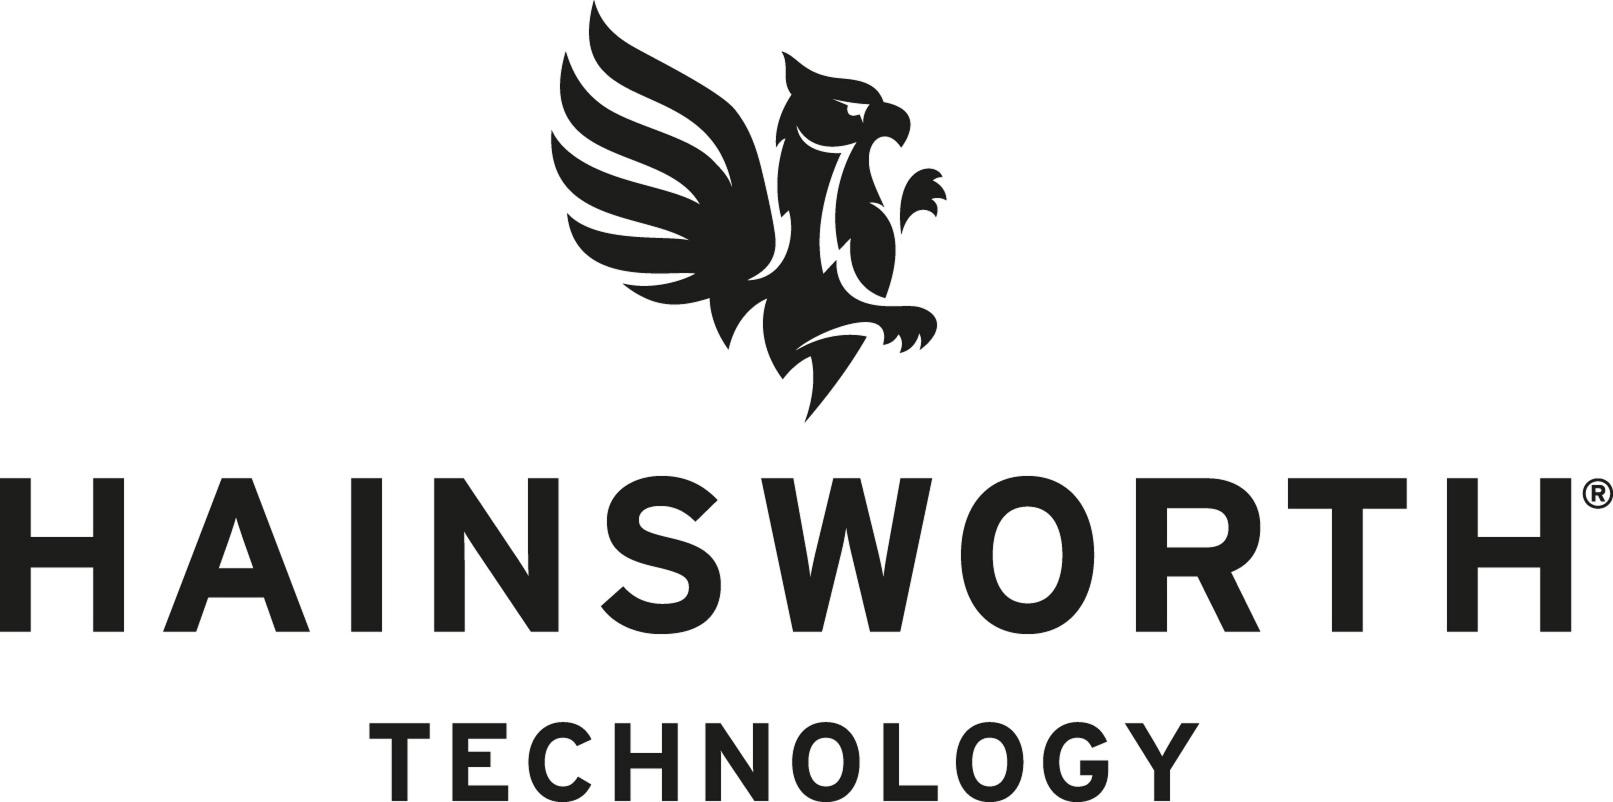 AW Hainsworth & Sons Ltd